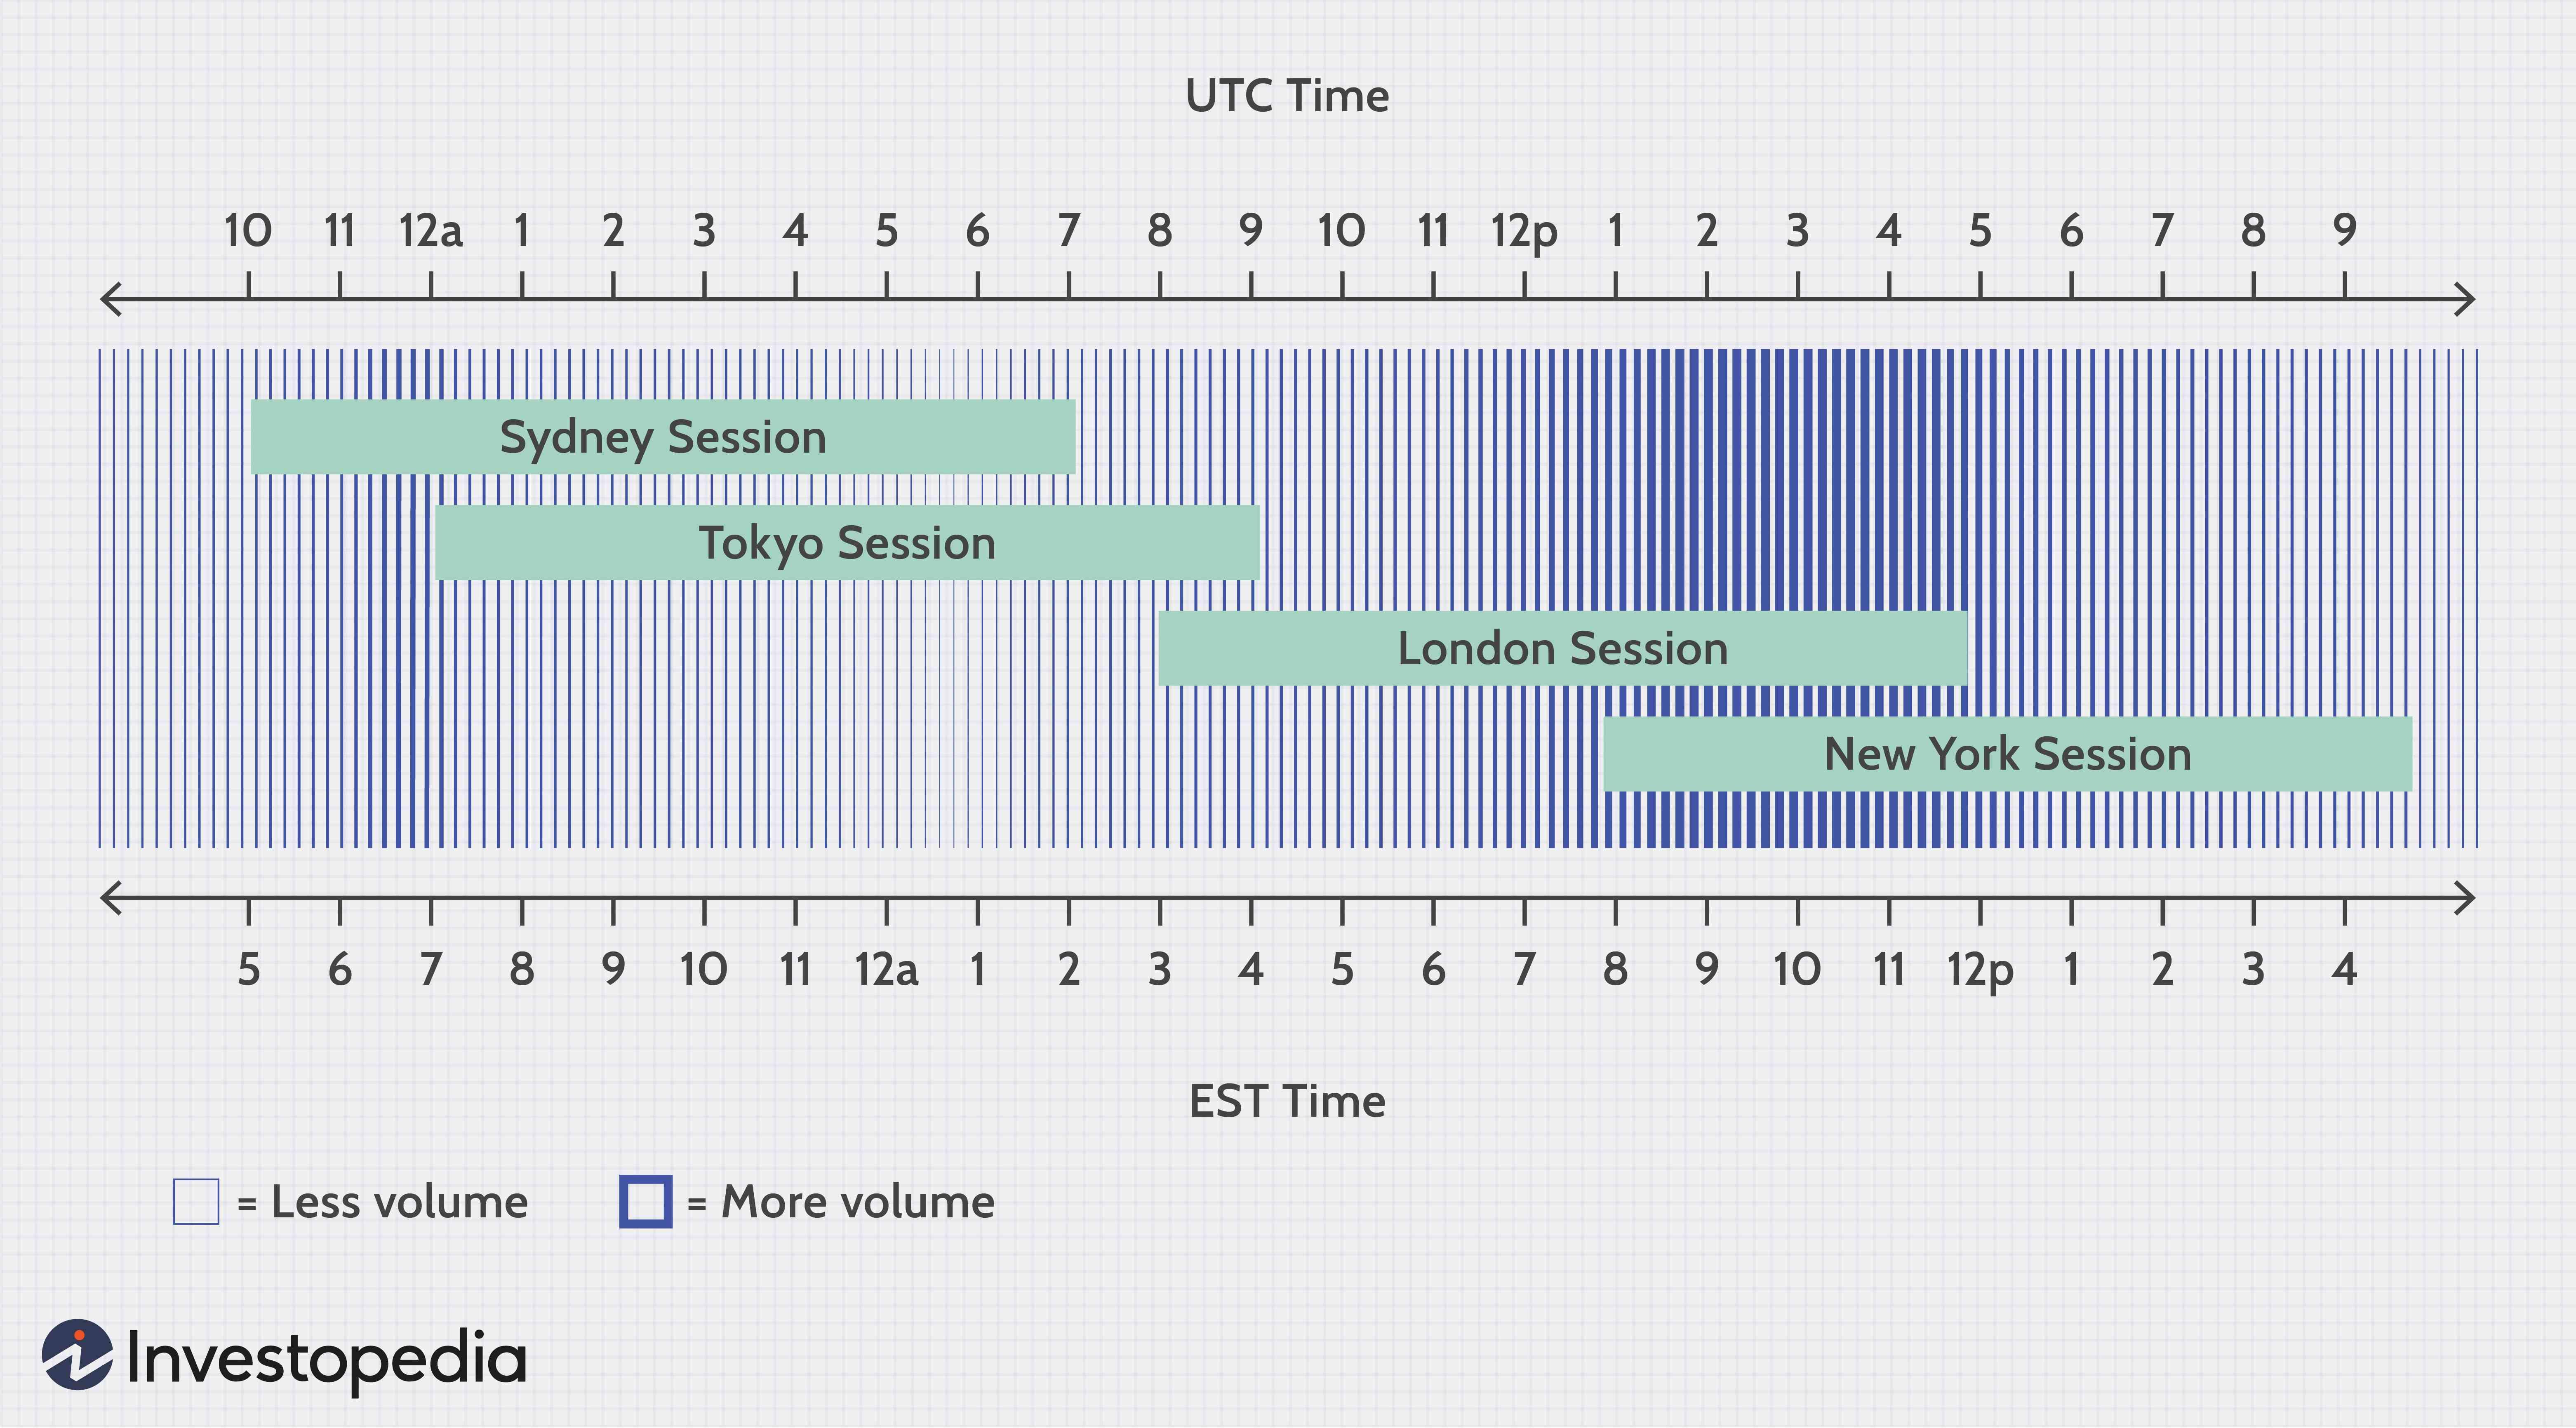 Pontypridd market times forex calculate rate of return on investment formula revenue